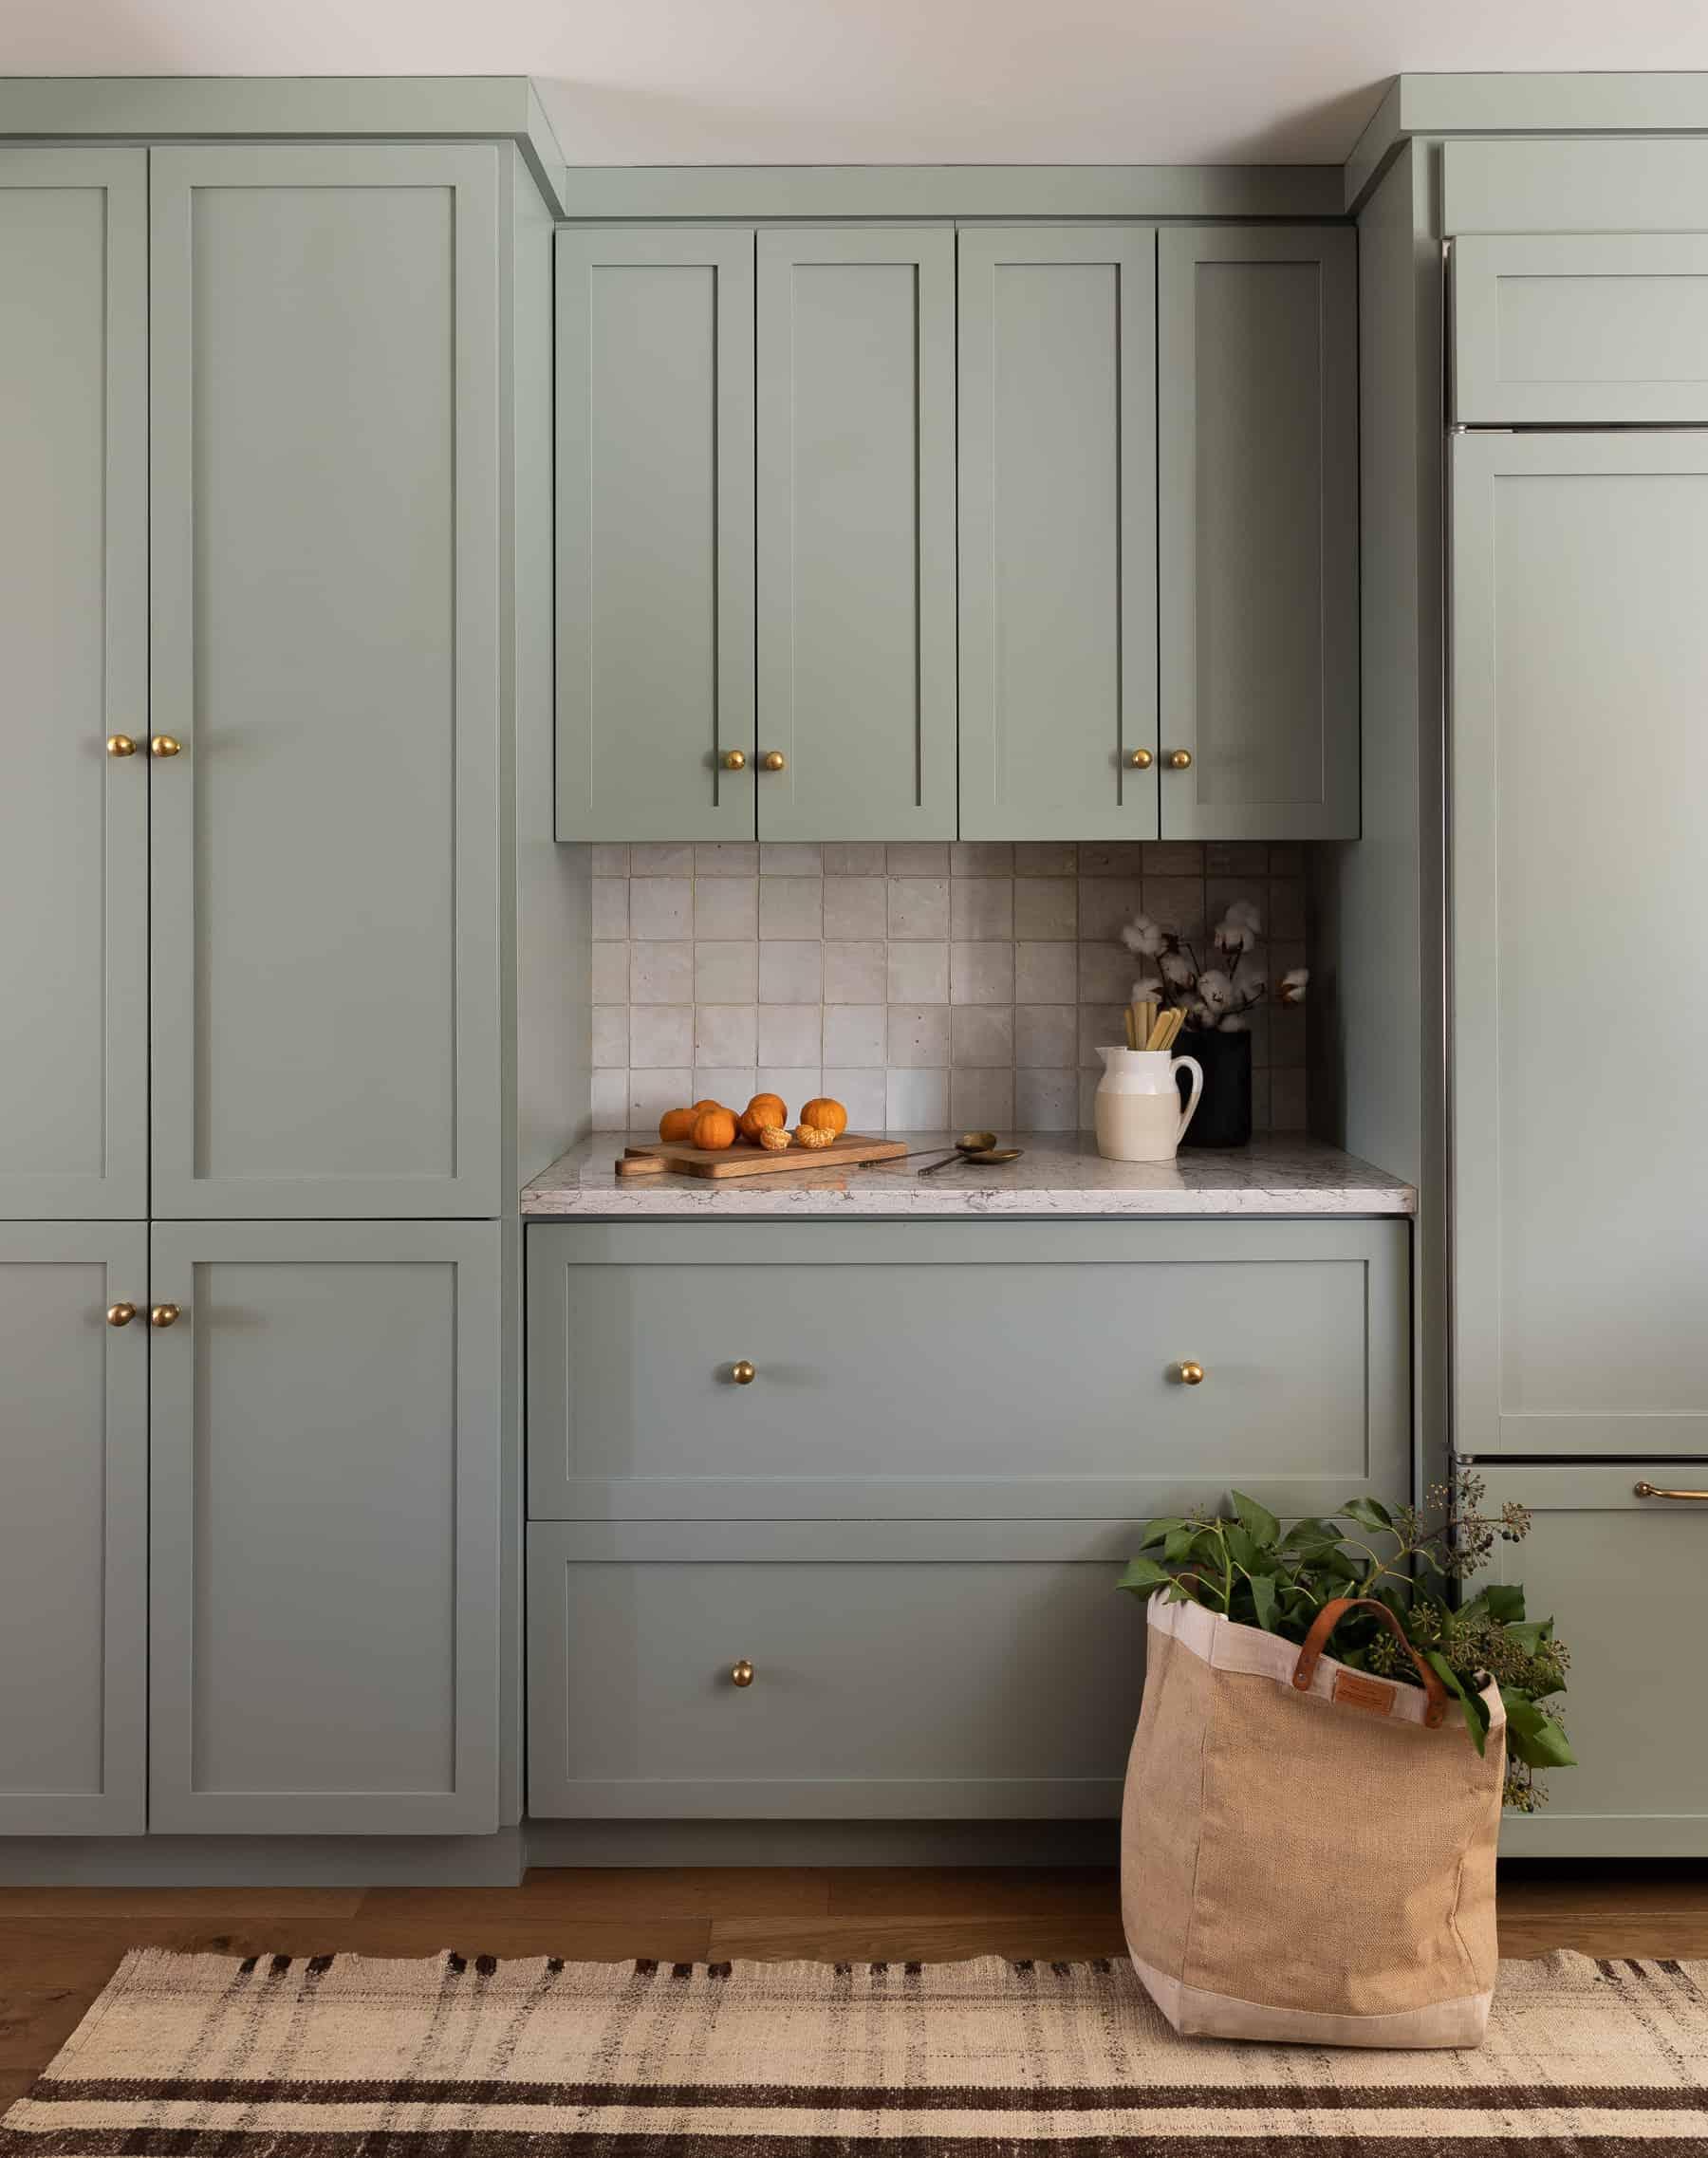 Modern Classic Kitchen Design: Heidi-Caillier-Design-Seattle-interior-designer-Olympic